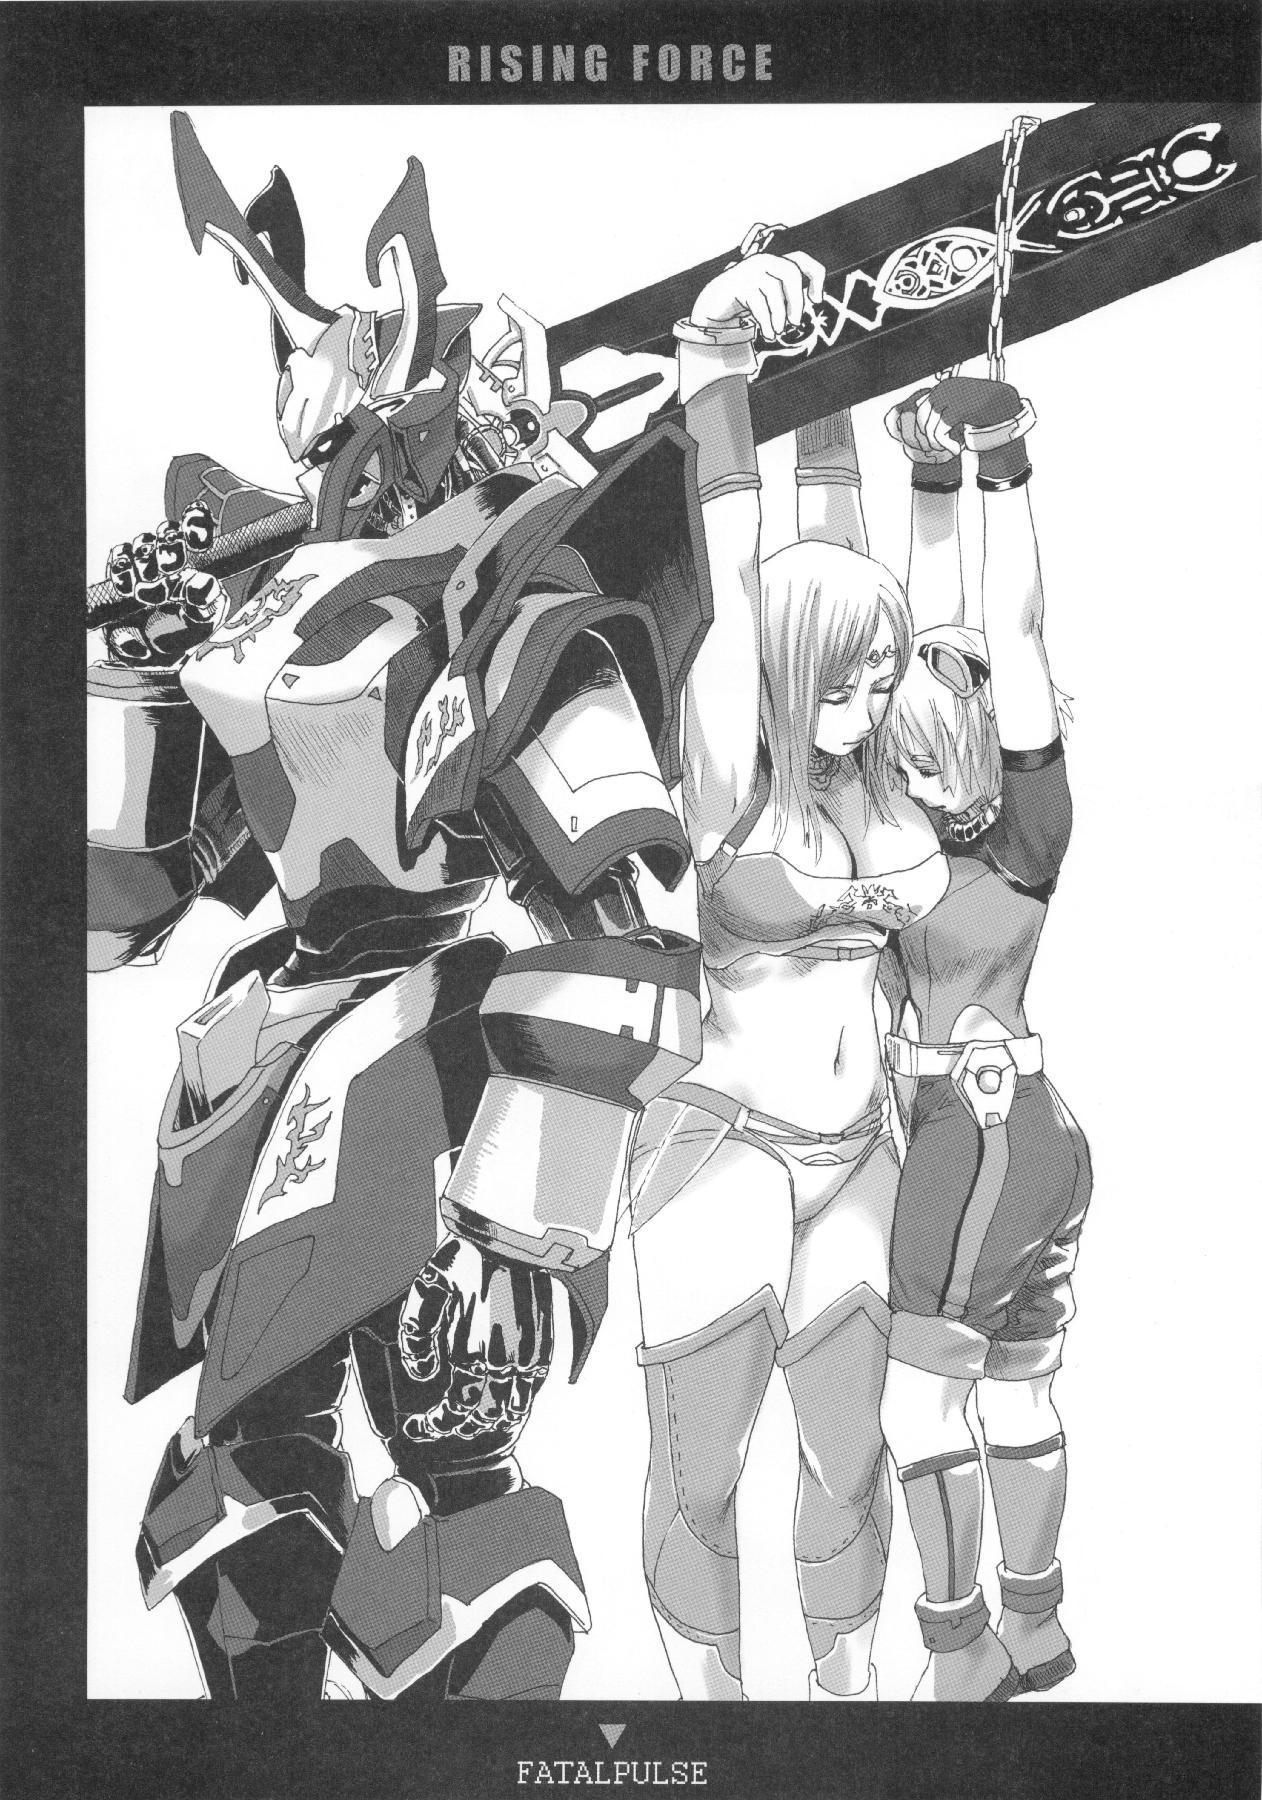 (C83) [Fatalpulse (Asanagi)] VictimGirls Compiled Vol.1 -Victimgirls Soushuuhen 1- MMO Game Selection (Various) 104